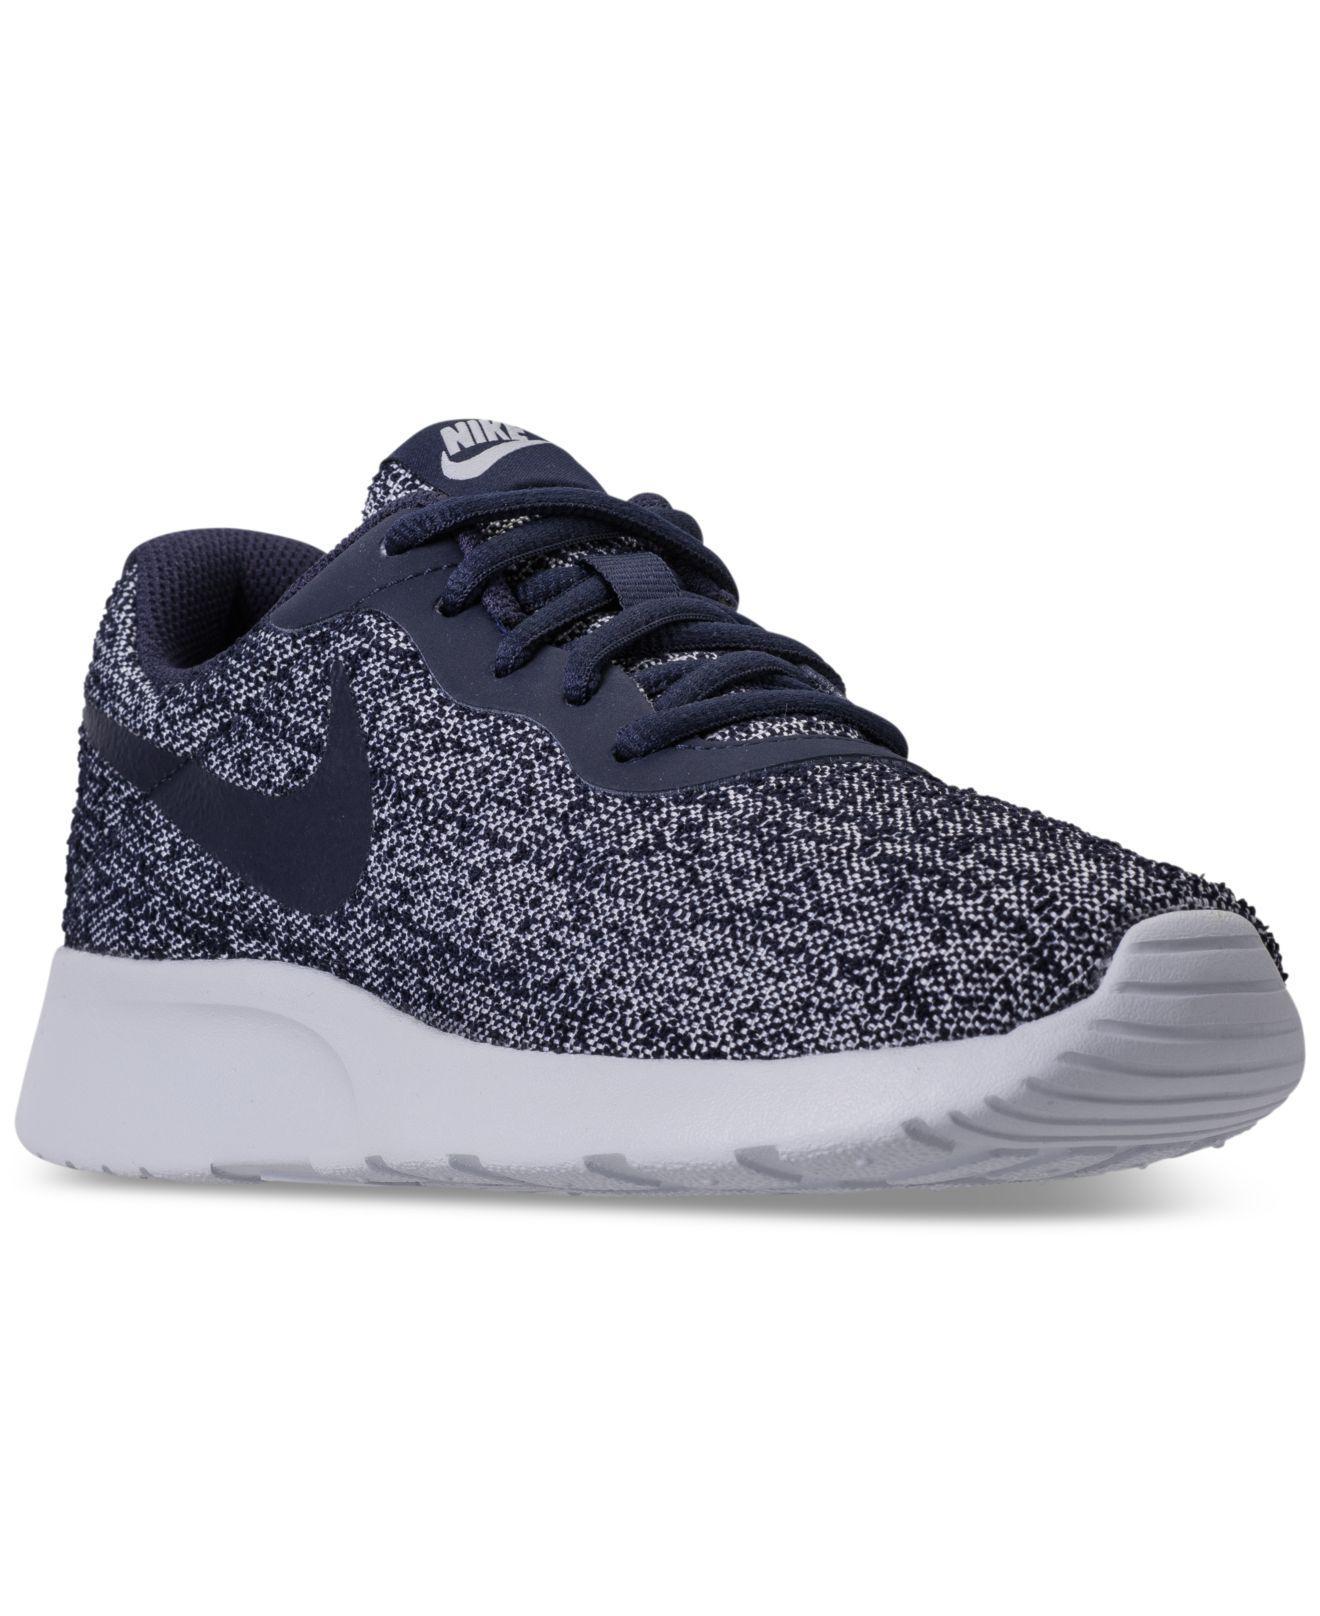 Lyst Nike WoHombres Tanjun Finish Indigo Casual Zapatillas De Finish Tanjun Line decea3